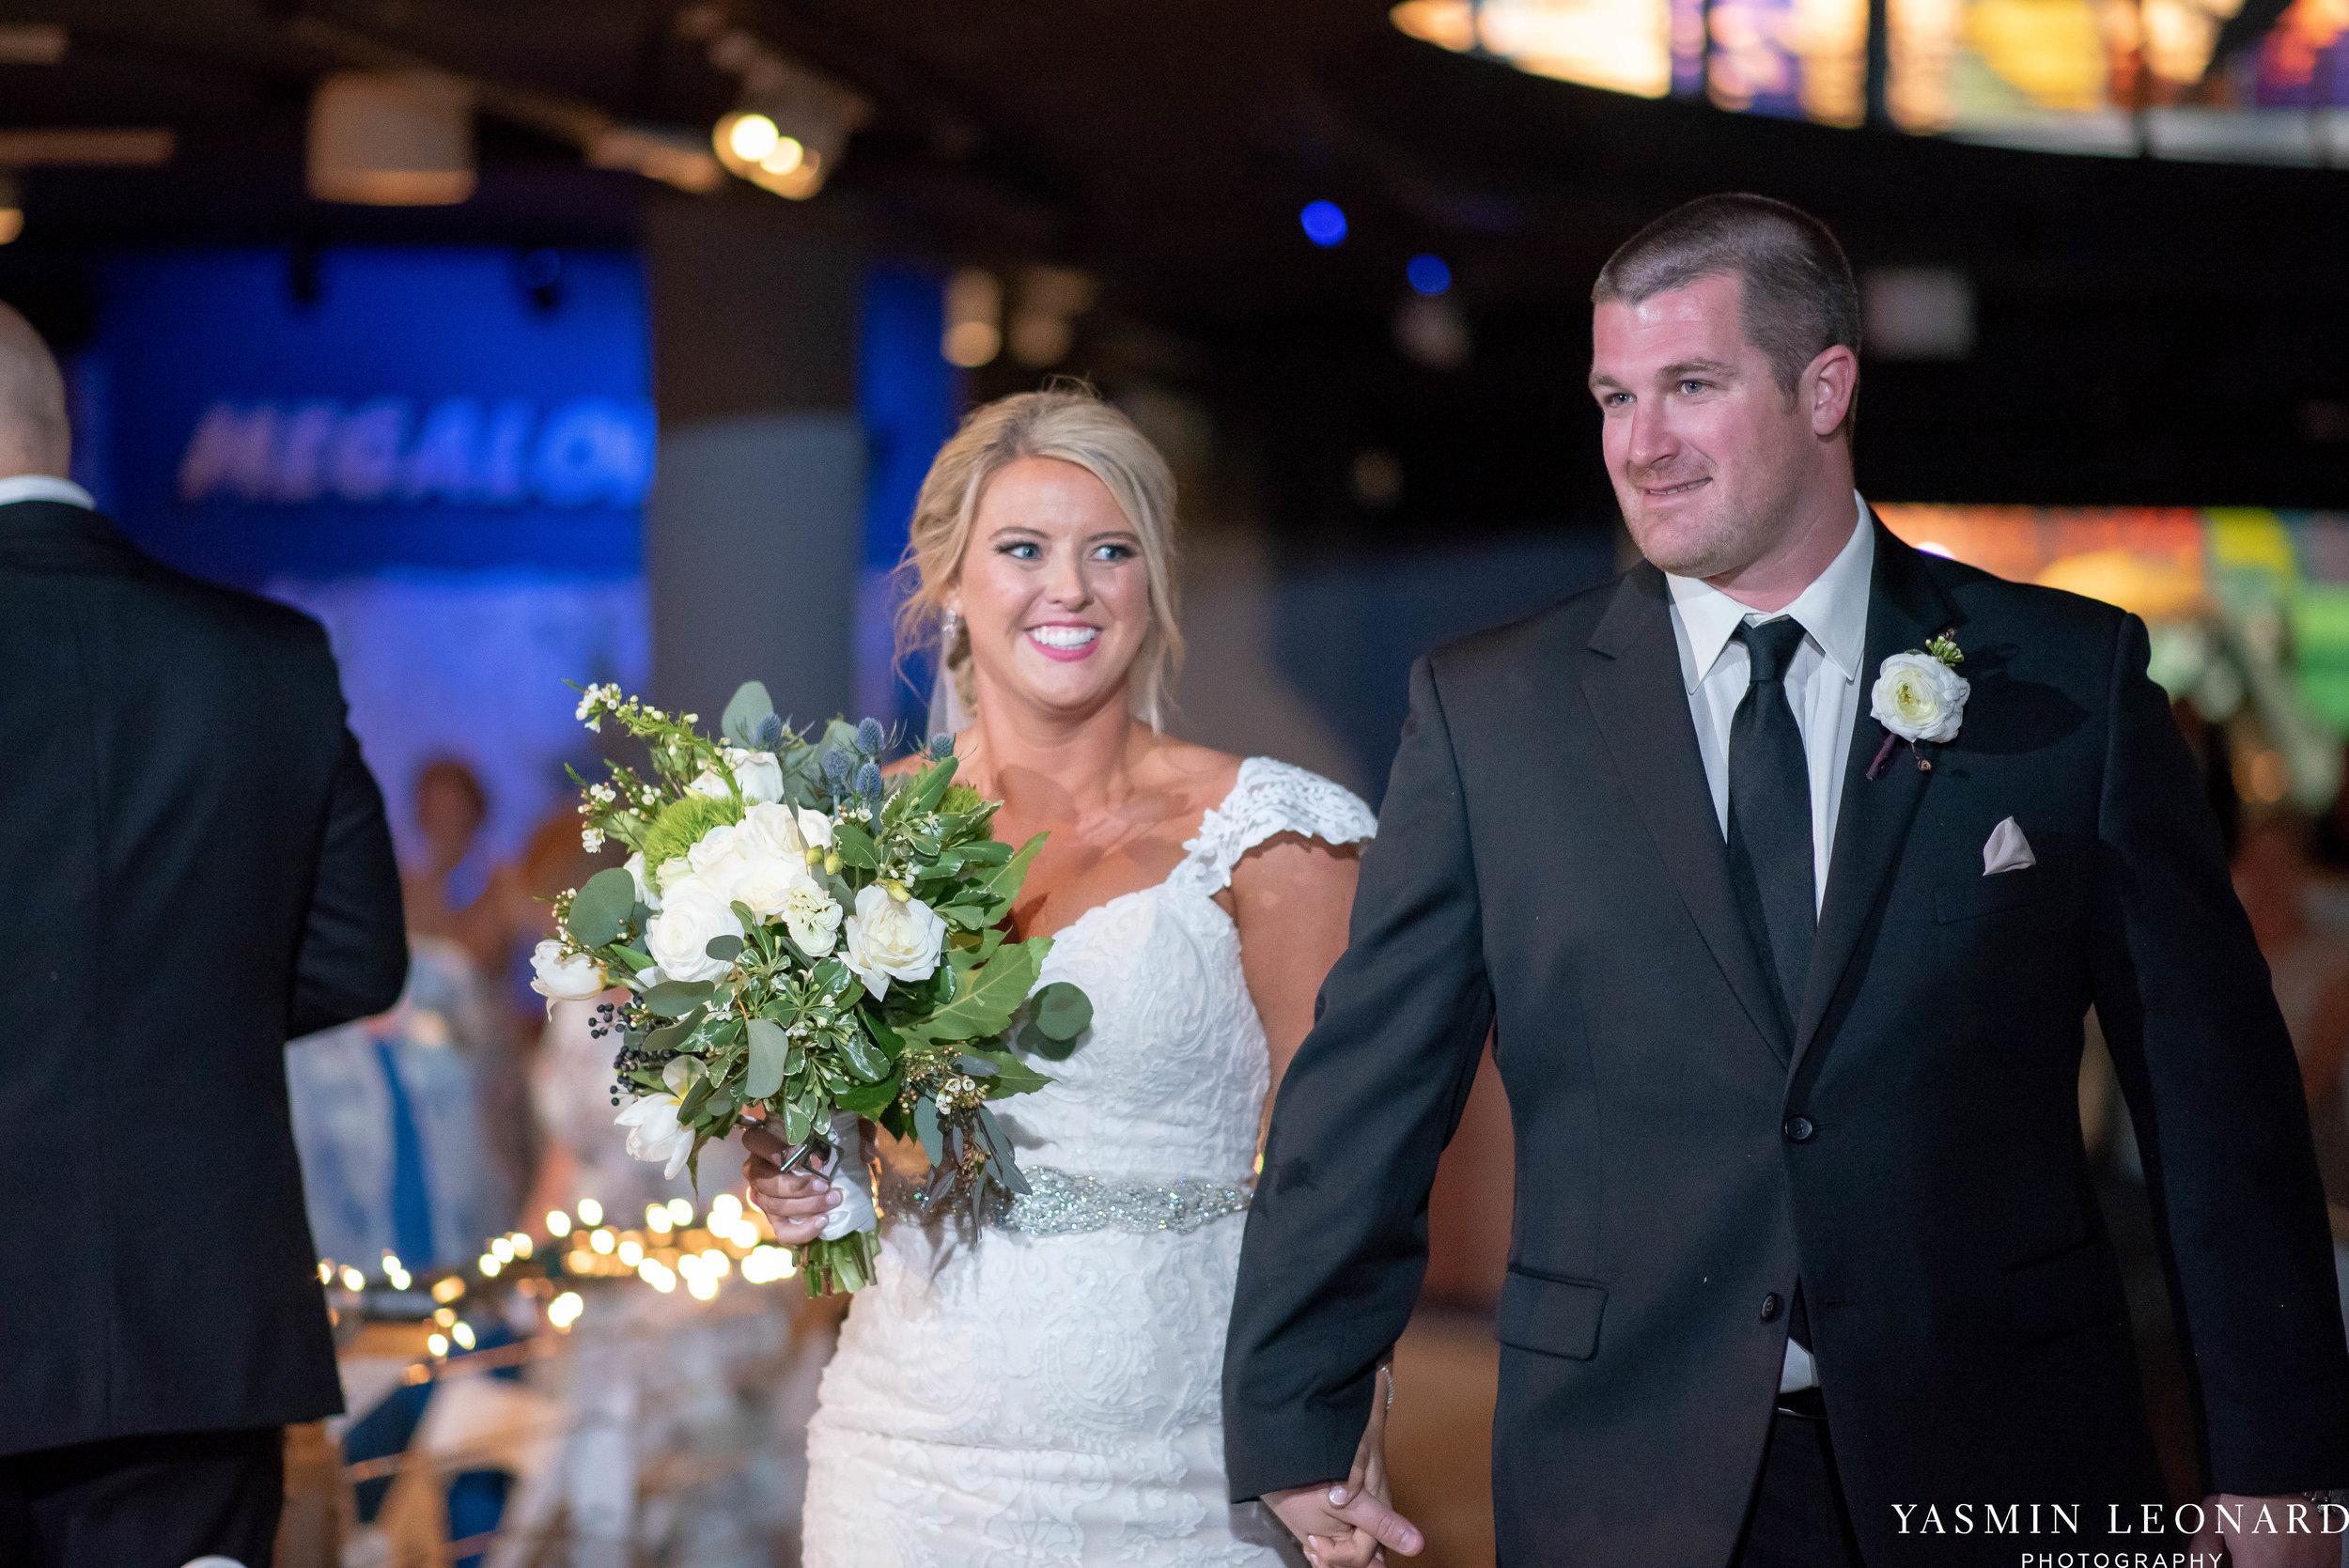 Carolina Beach Wedding - Fort Fisher Wedding - NC Acquarium - Beach Wedding - NC Wedding - Beach Wedding Inspiration - Beach Bride-41.jpg